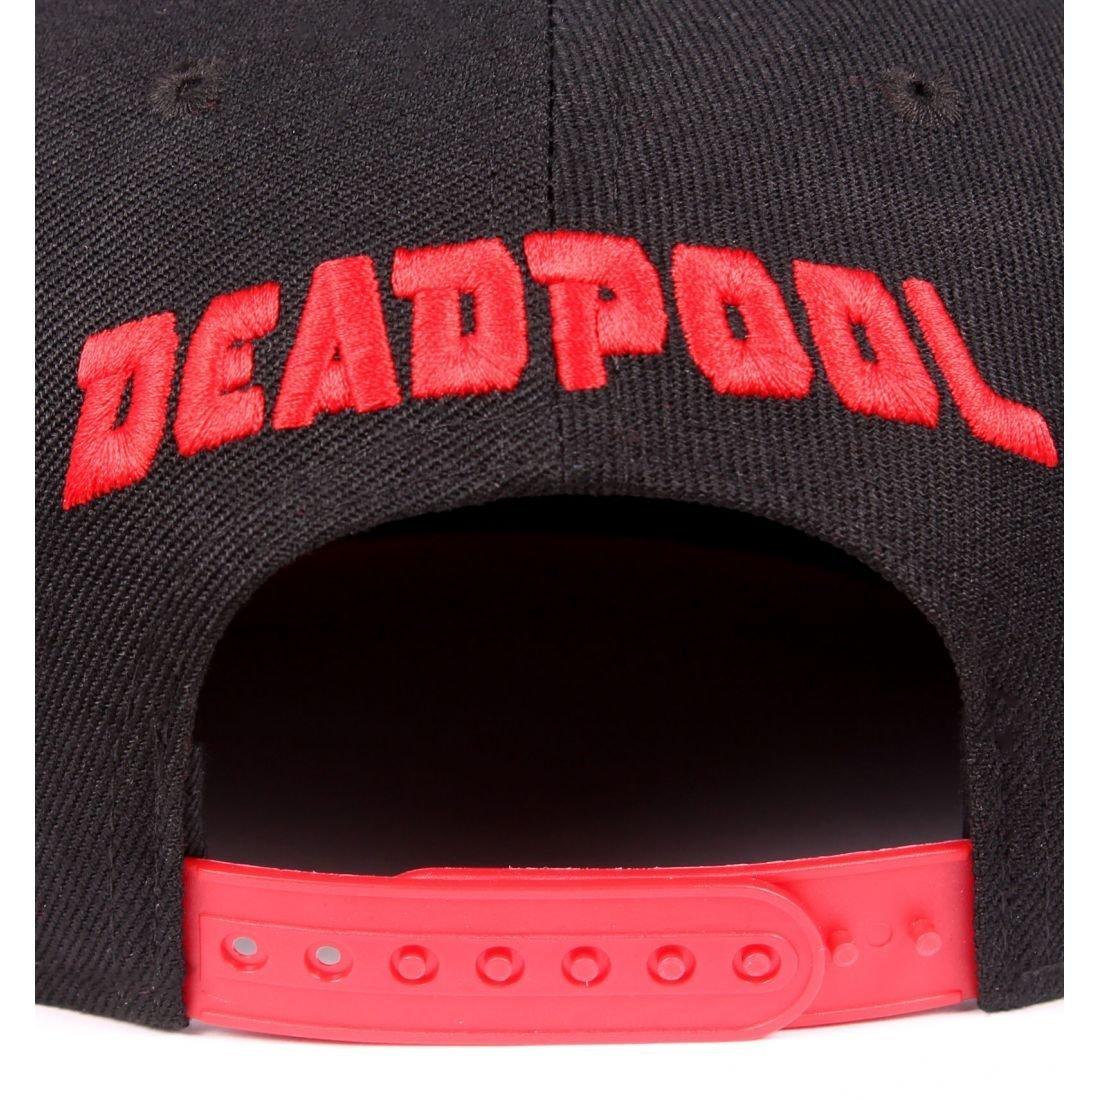 Legend Icon-Cappellopello Unisex Marvel Casquette Snapback Deadpool Adulto